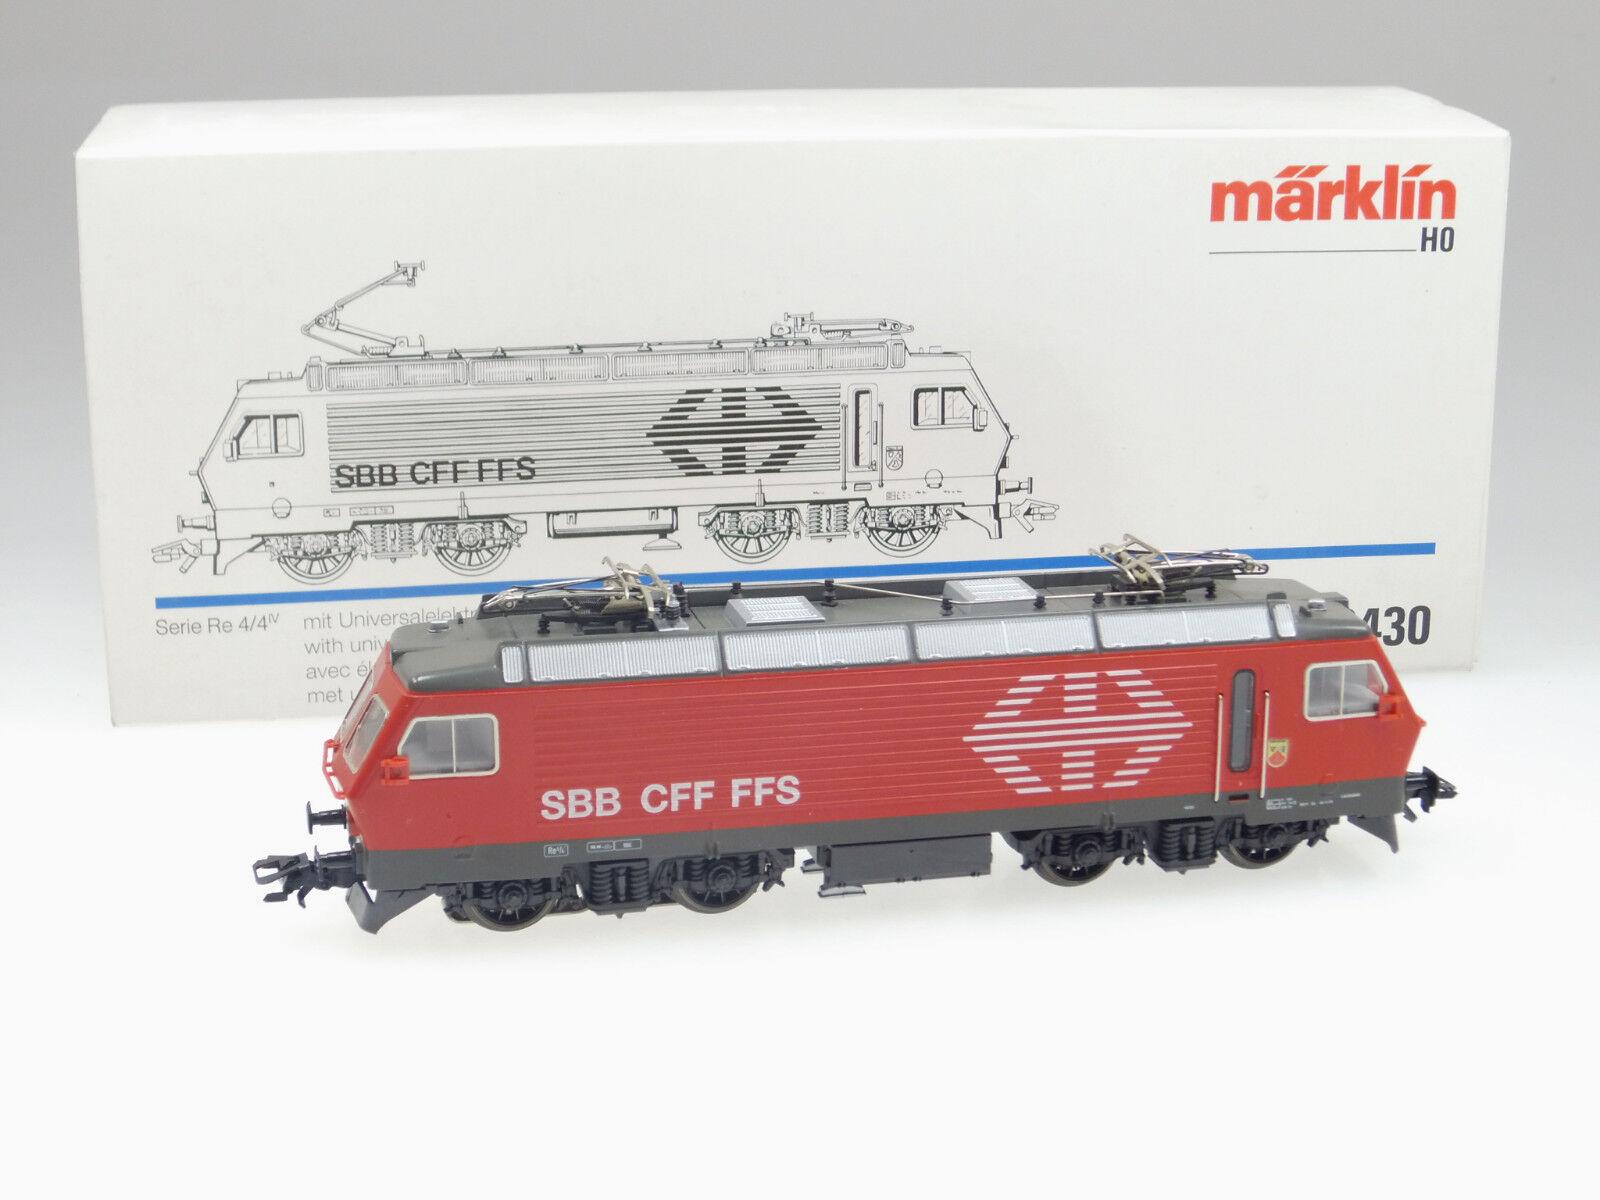 97/002    h0 E-Lok serie re 4/4 10 101 SBB  Art. - N. 3430  AC/DIGITALE